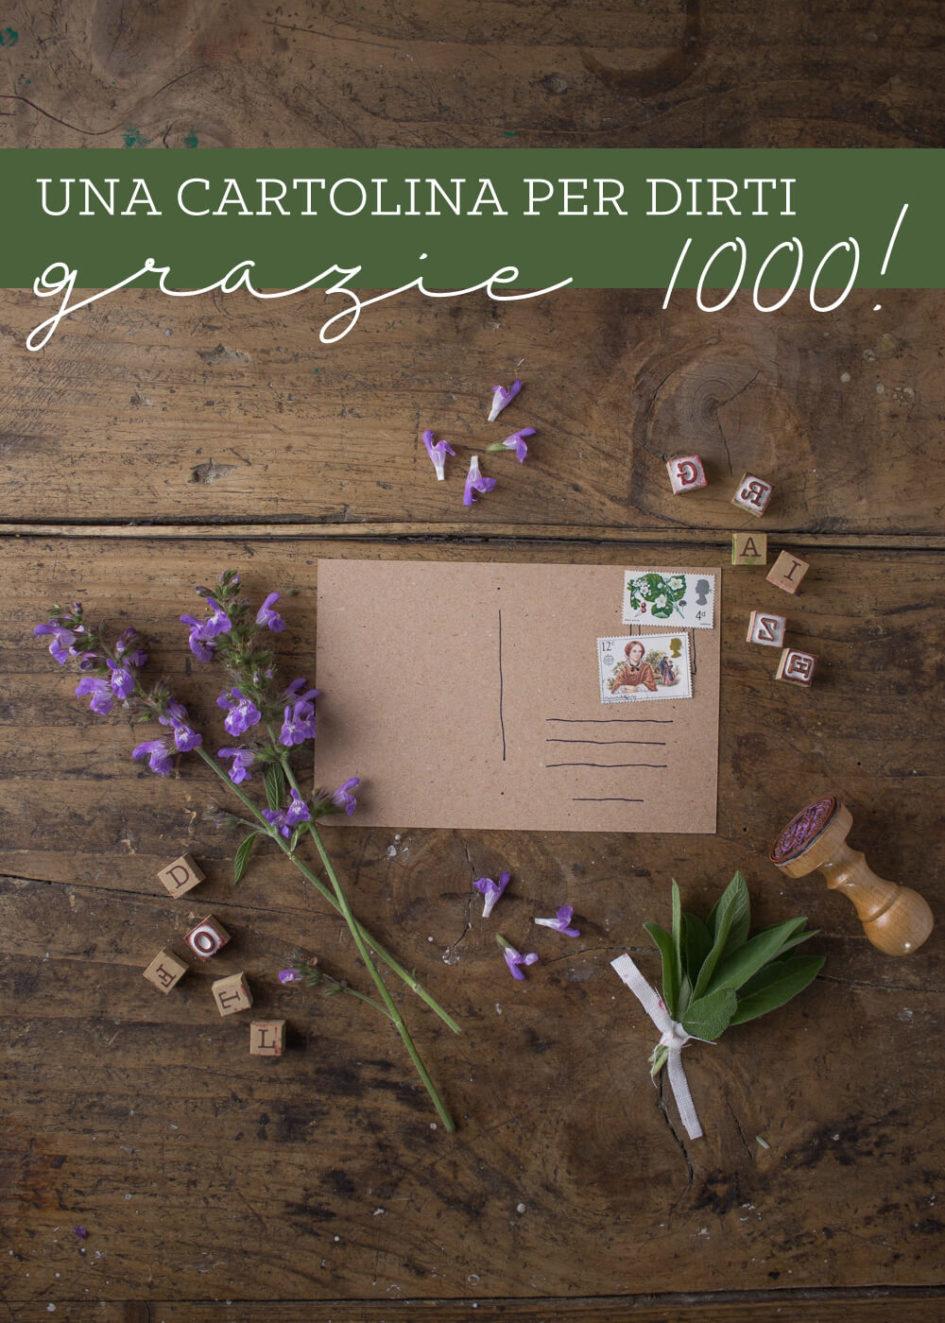 Una cartolina per dirti grazie 1000 - Lily&Sage Design